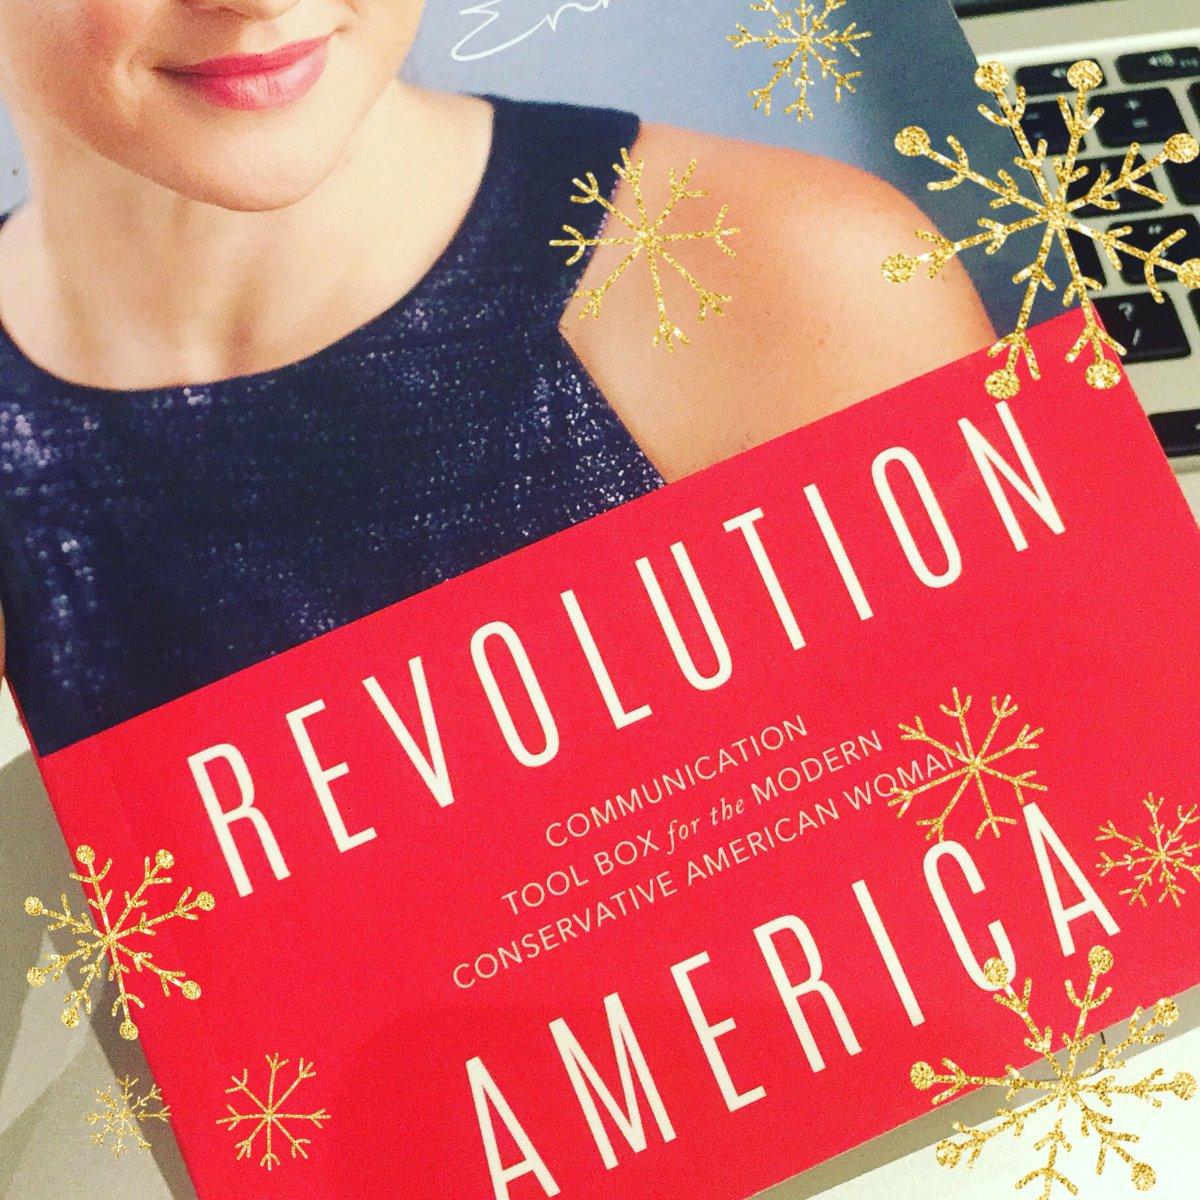 #RevolutionAmerica is officially Release...